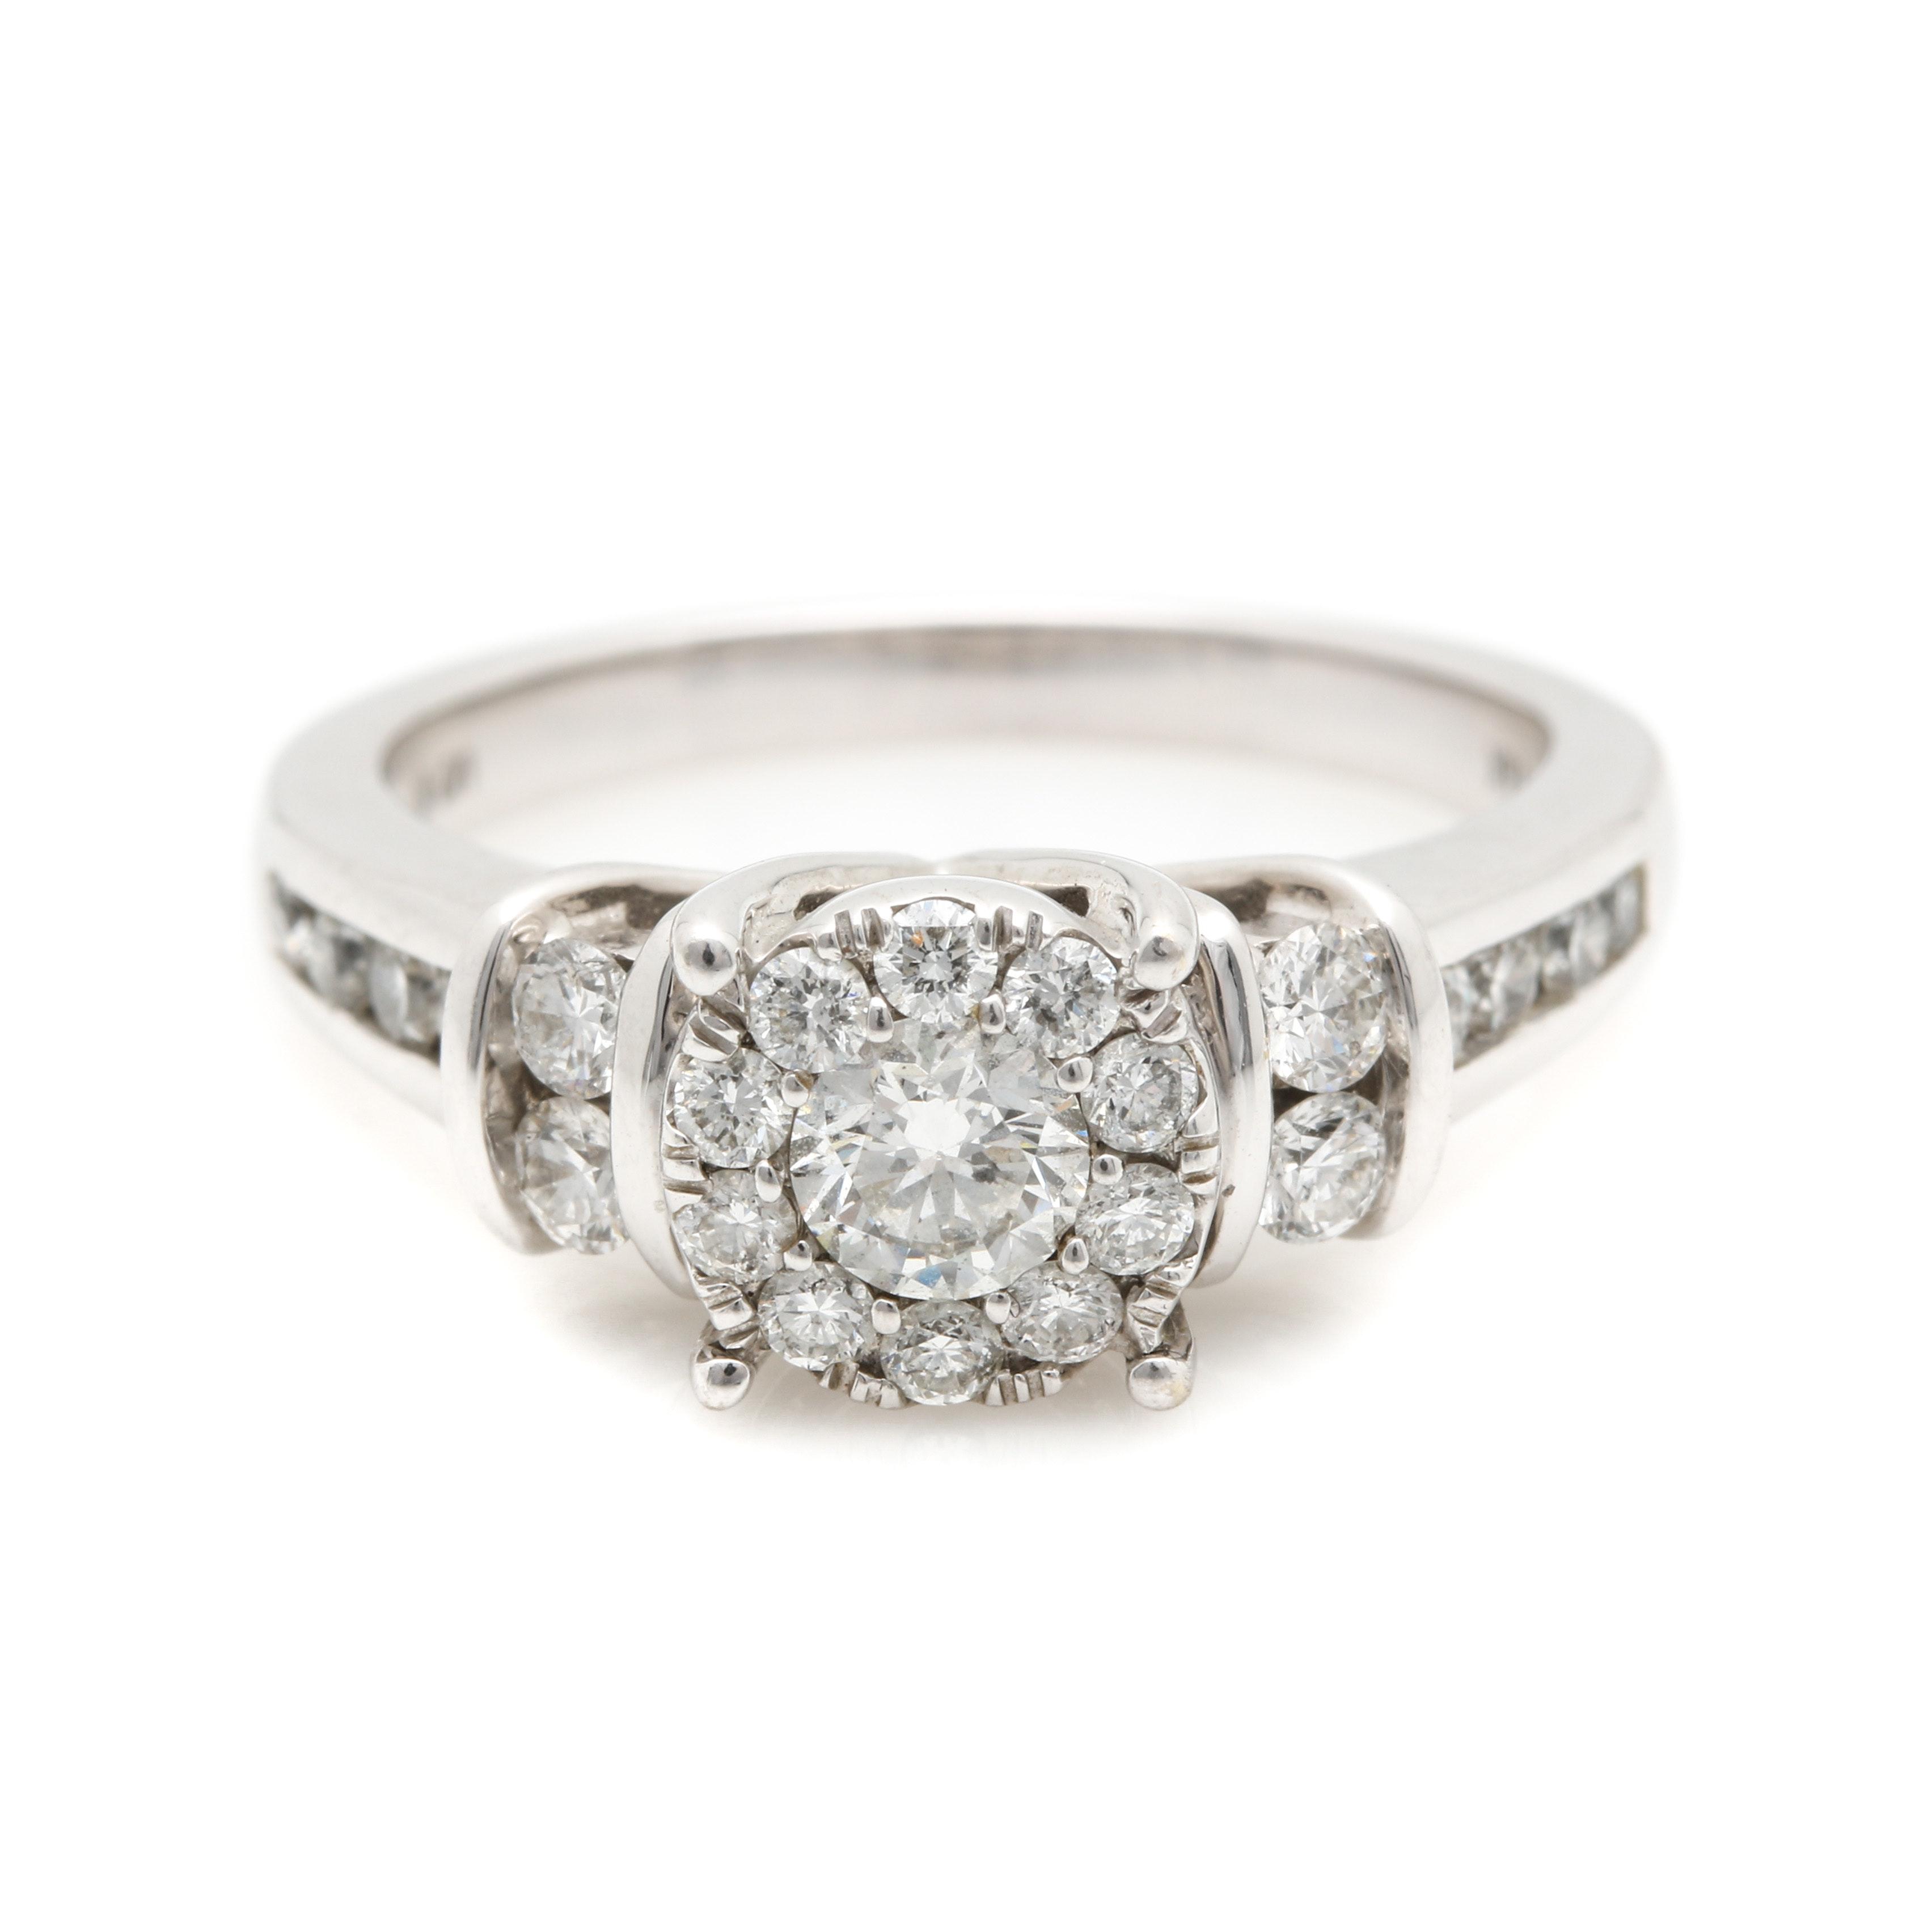 14K White Gold Diamond Halo Ring